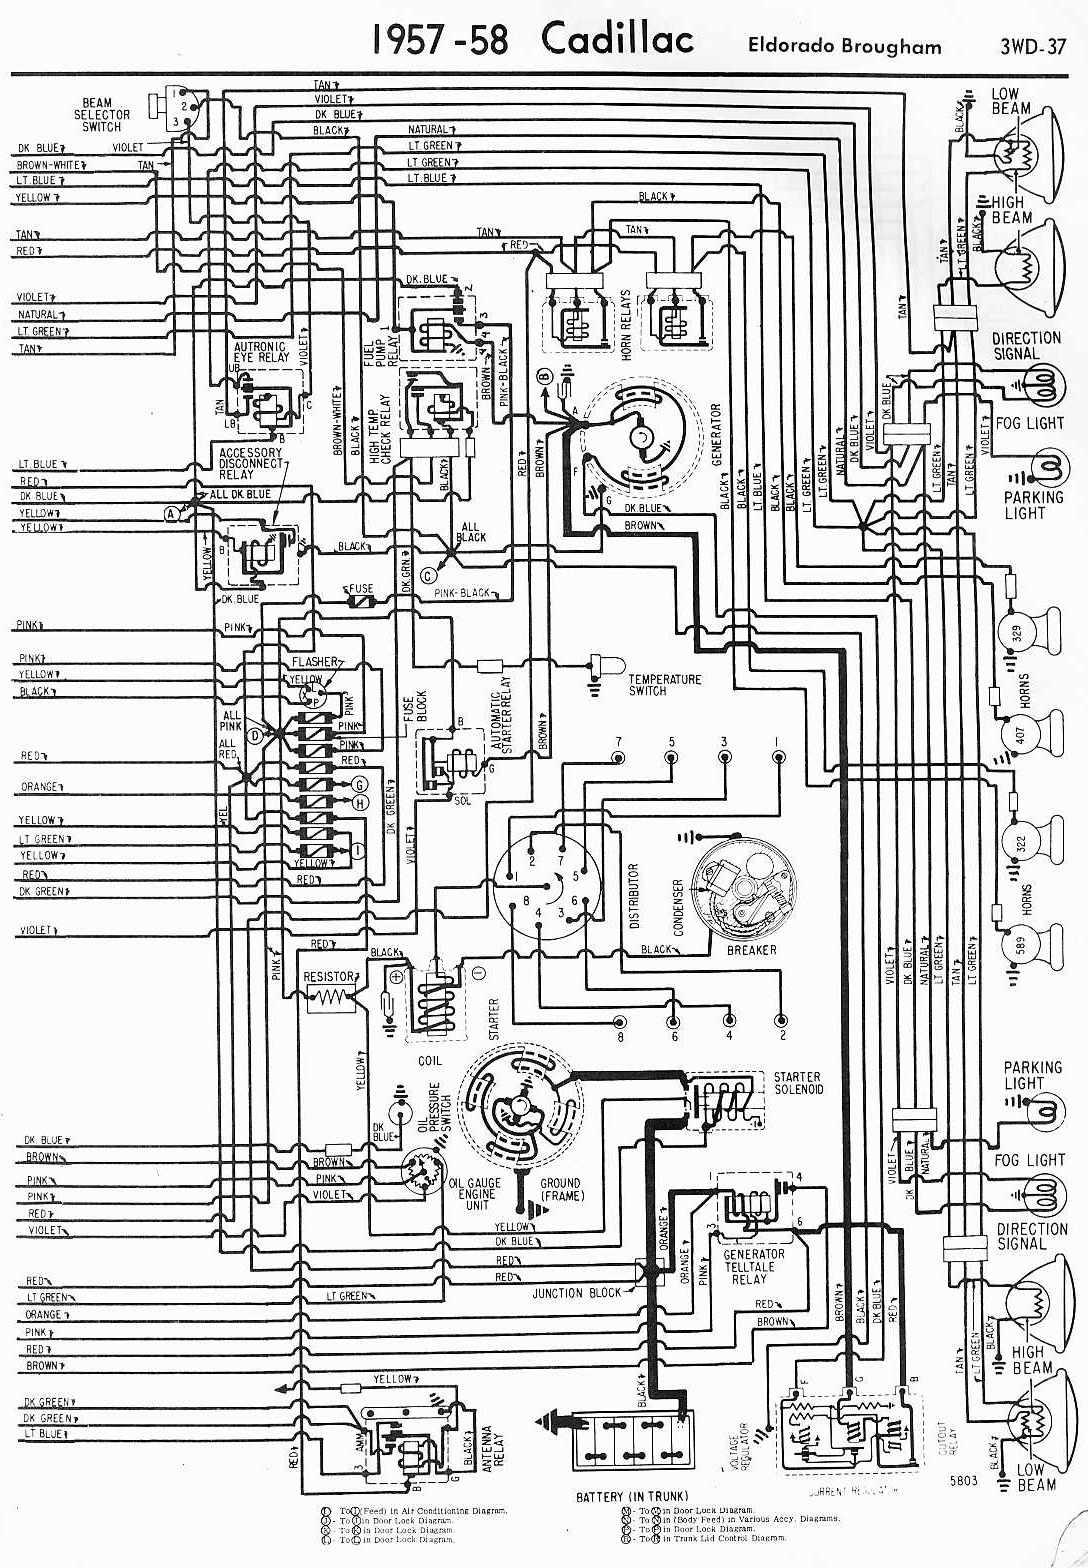 1969 cadillac body wiring diagram wire center \u2022 1965 mustang wiring diagram 1969 cadillac body wiring diagram images gallery